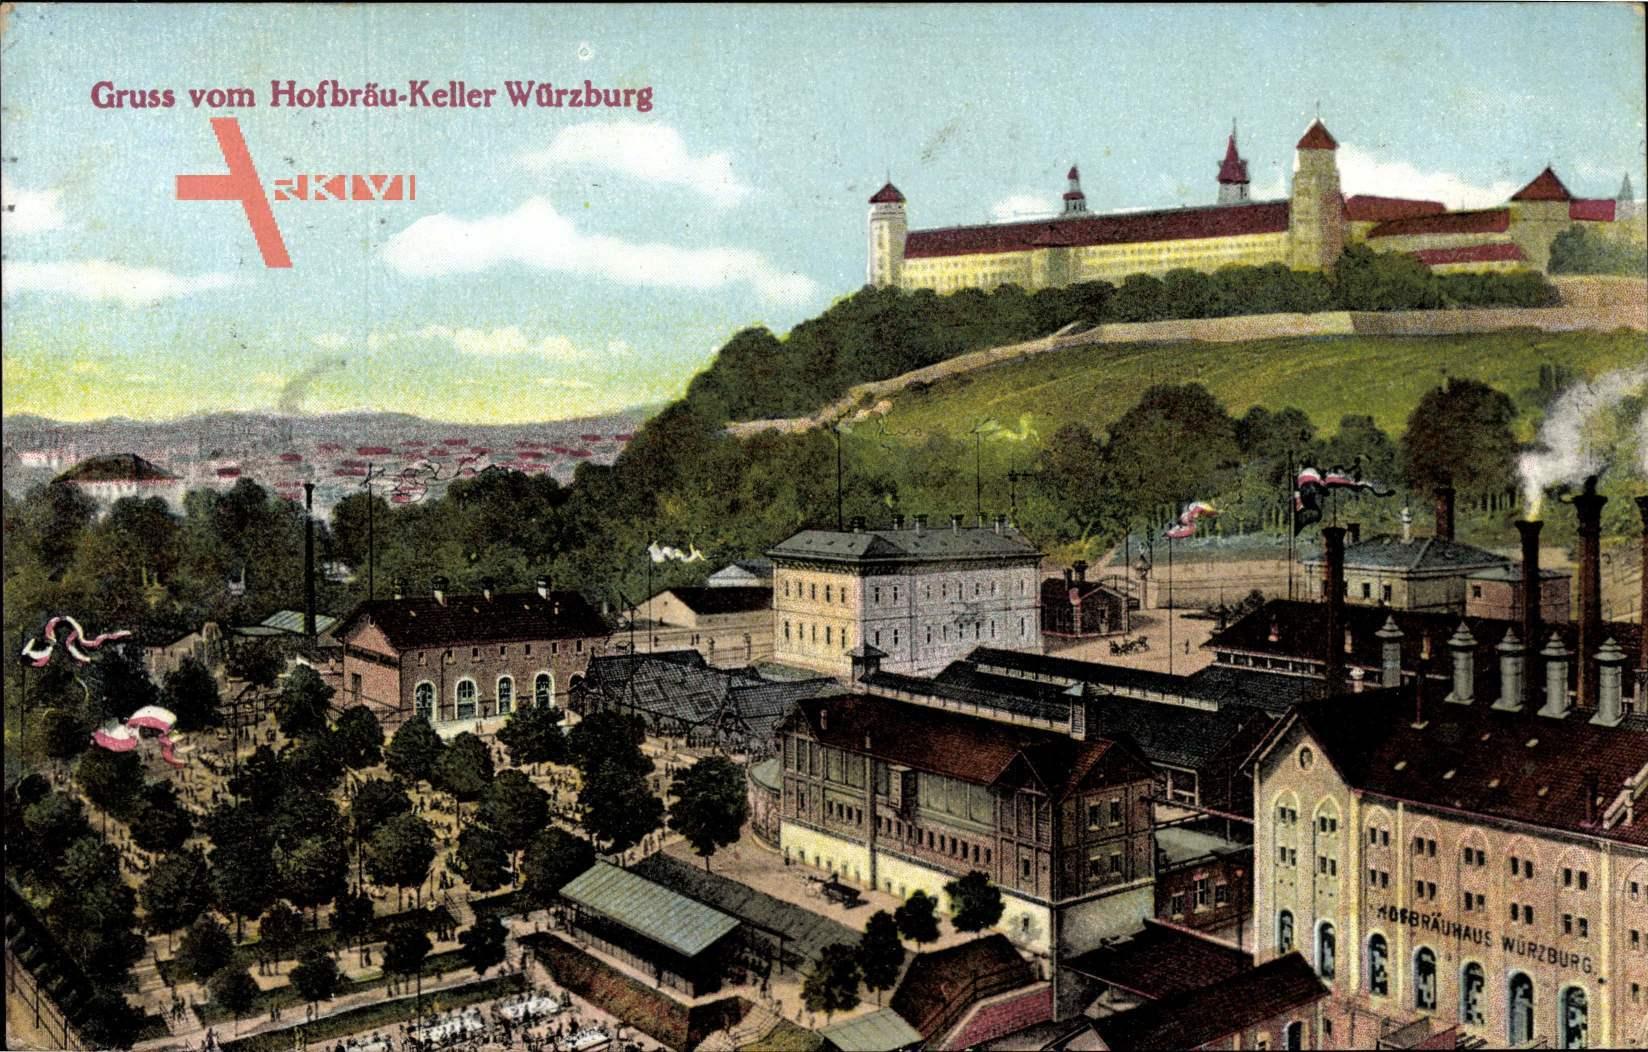 Würzburg am Main Unterfranken, Hofbräu Keller, Stadtpanorama